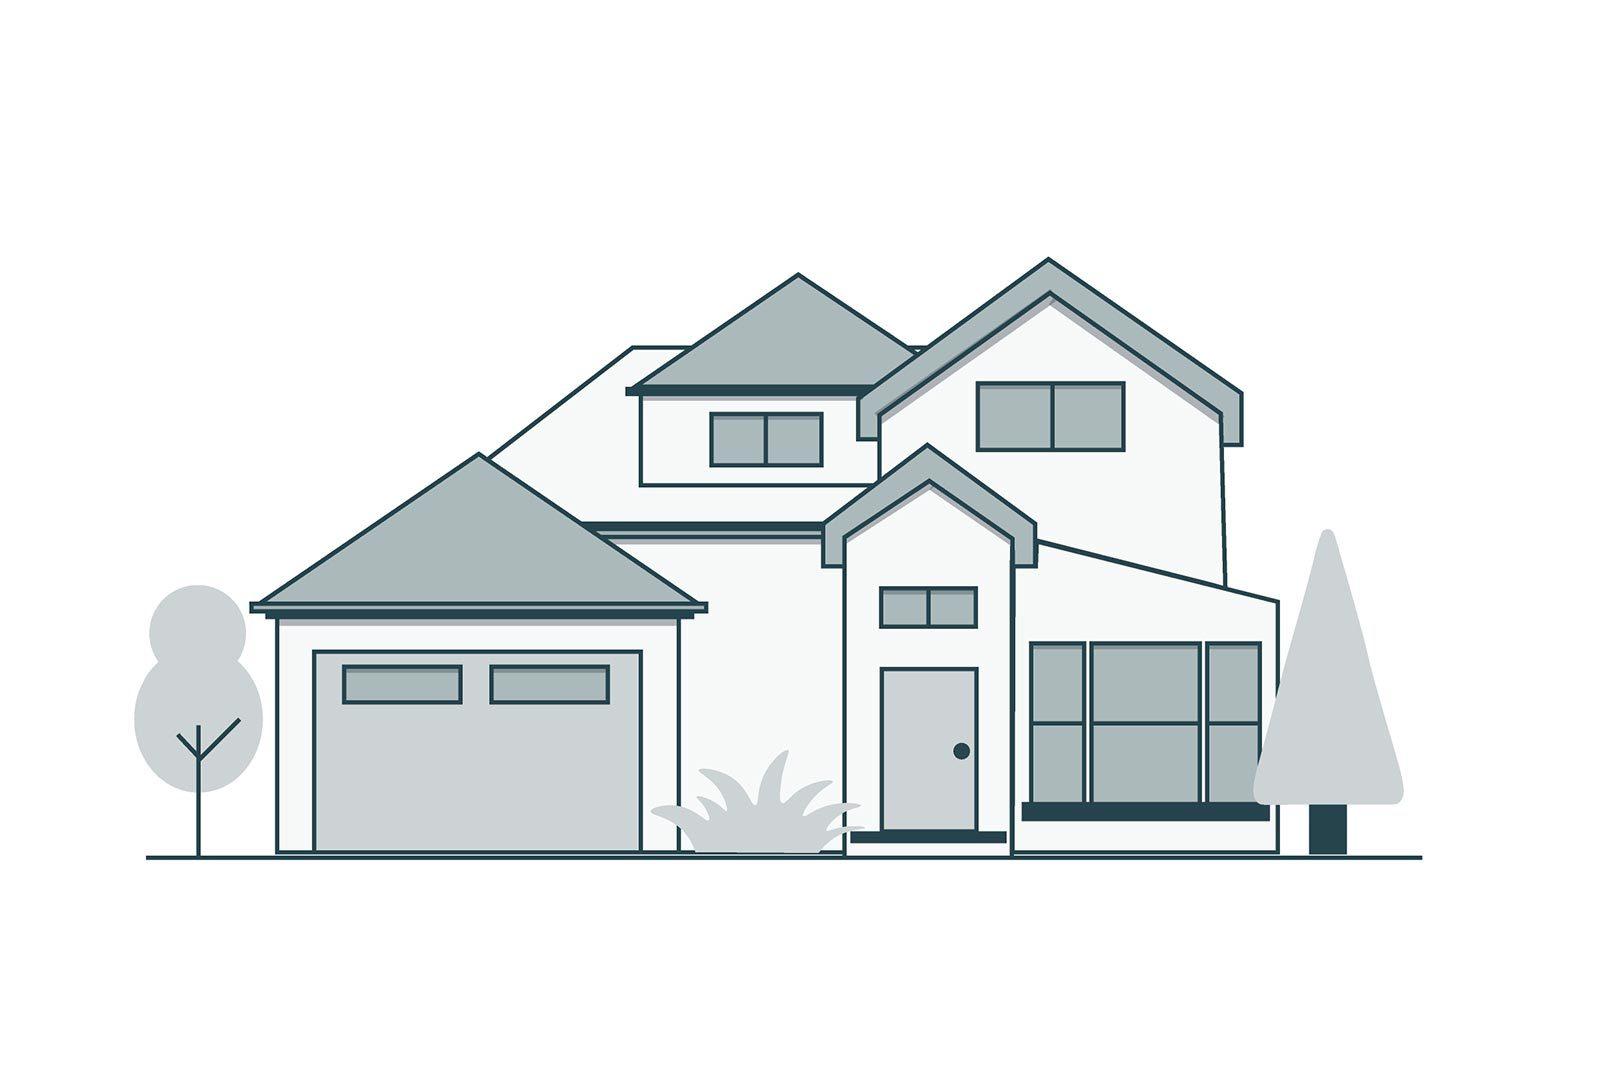 1070 Post St Apt 1A San Francisco, CA 94109